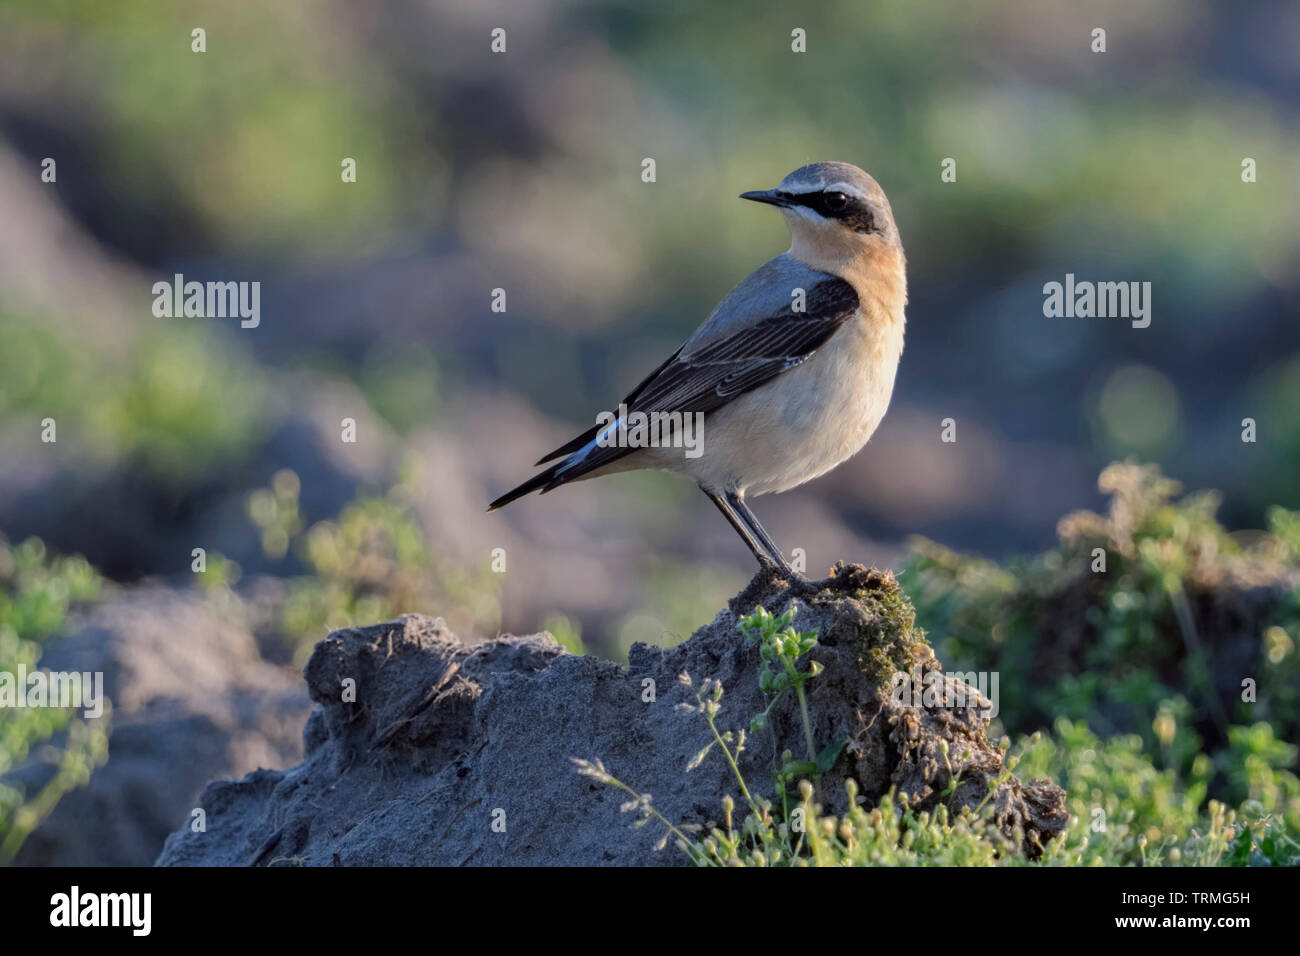 Northern Wheatear / Steinschmätzer ( Oenanthe oenanthe ), male adult, bird migration, resting on farmland, wildlife, Europe. Stock Photo